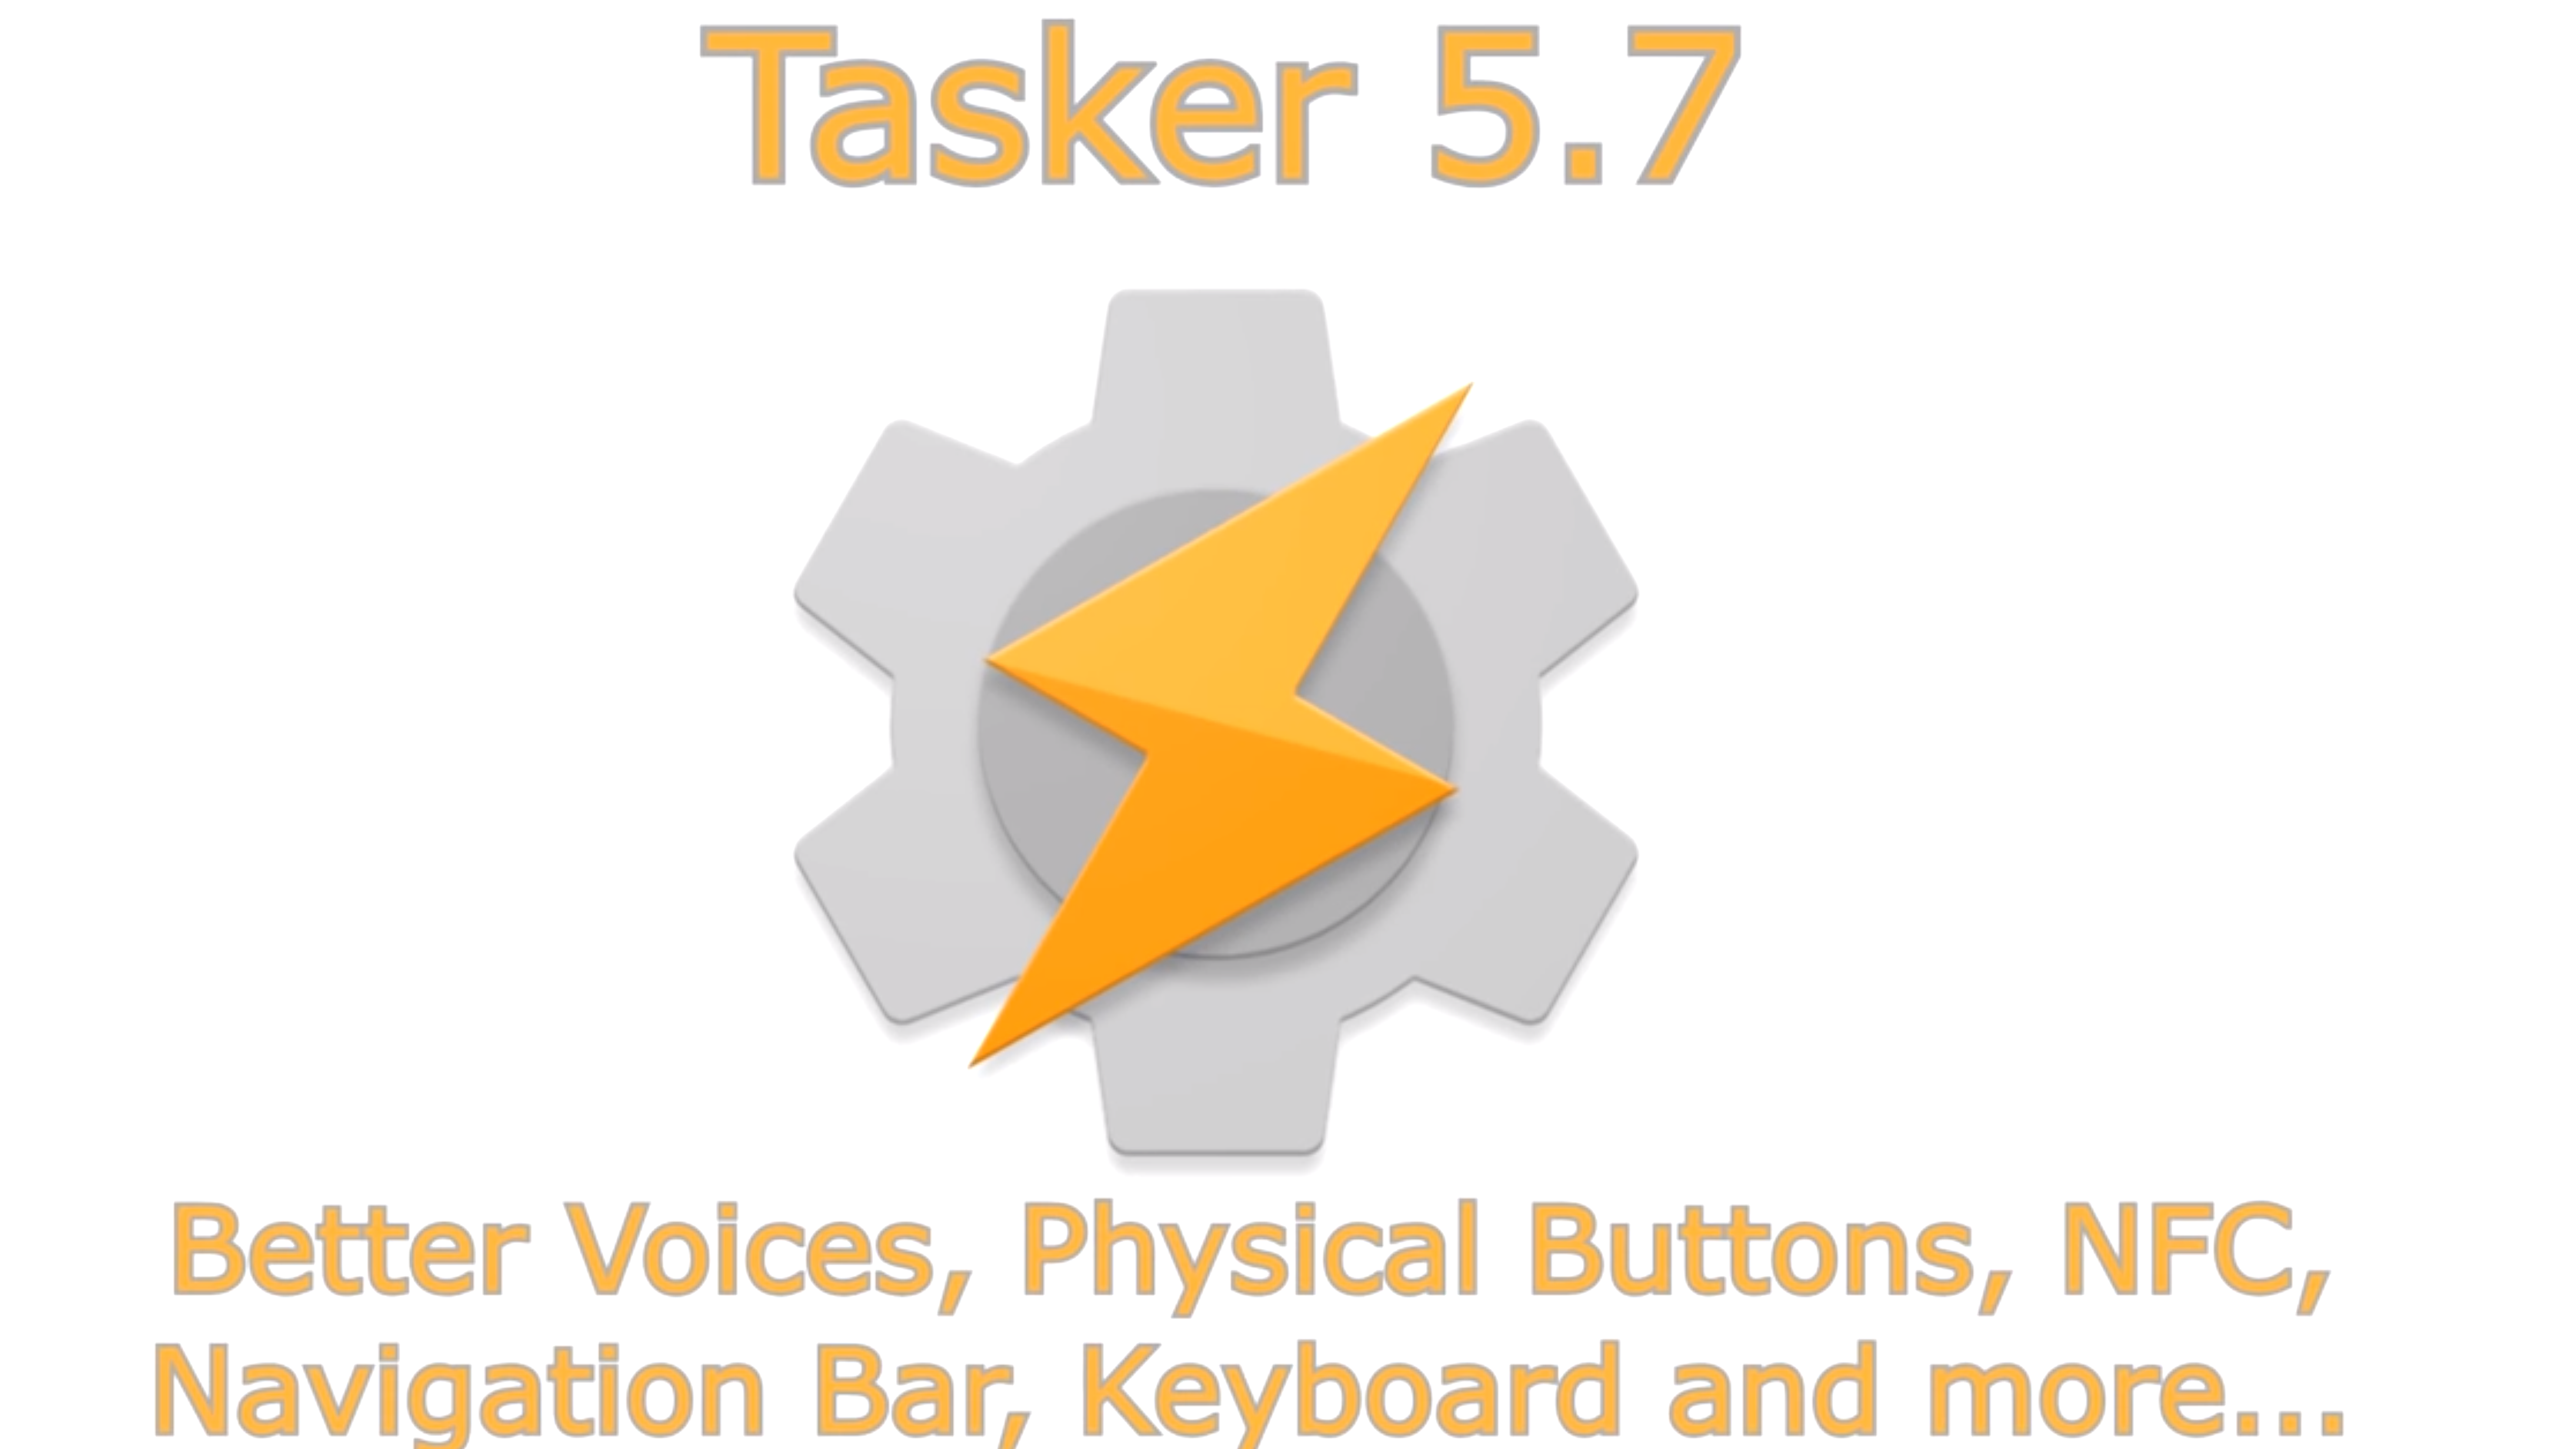 Mammoth Tasker v5 7 update brings WaveNet voices, nav bar